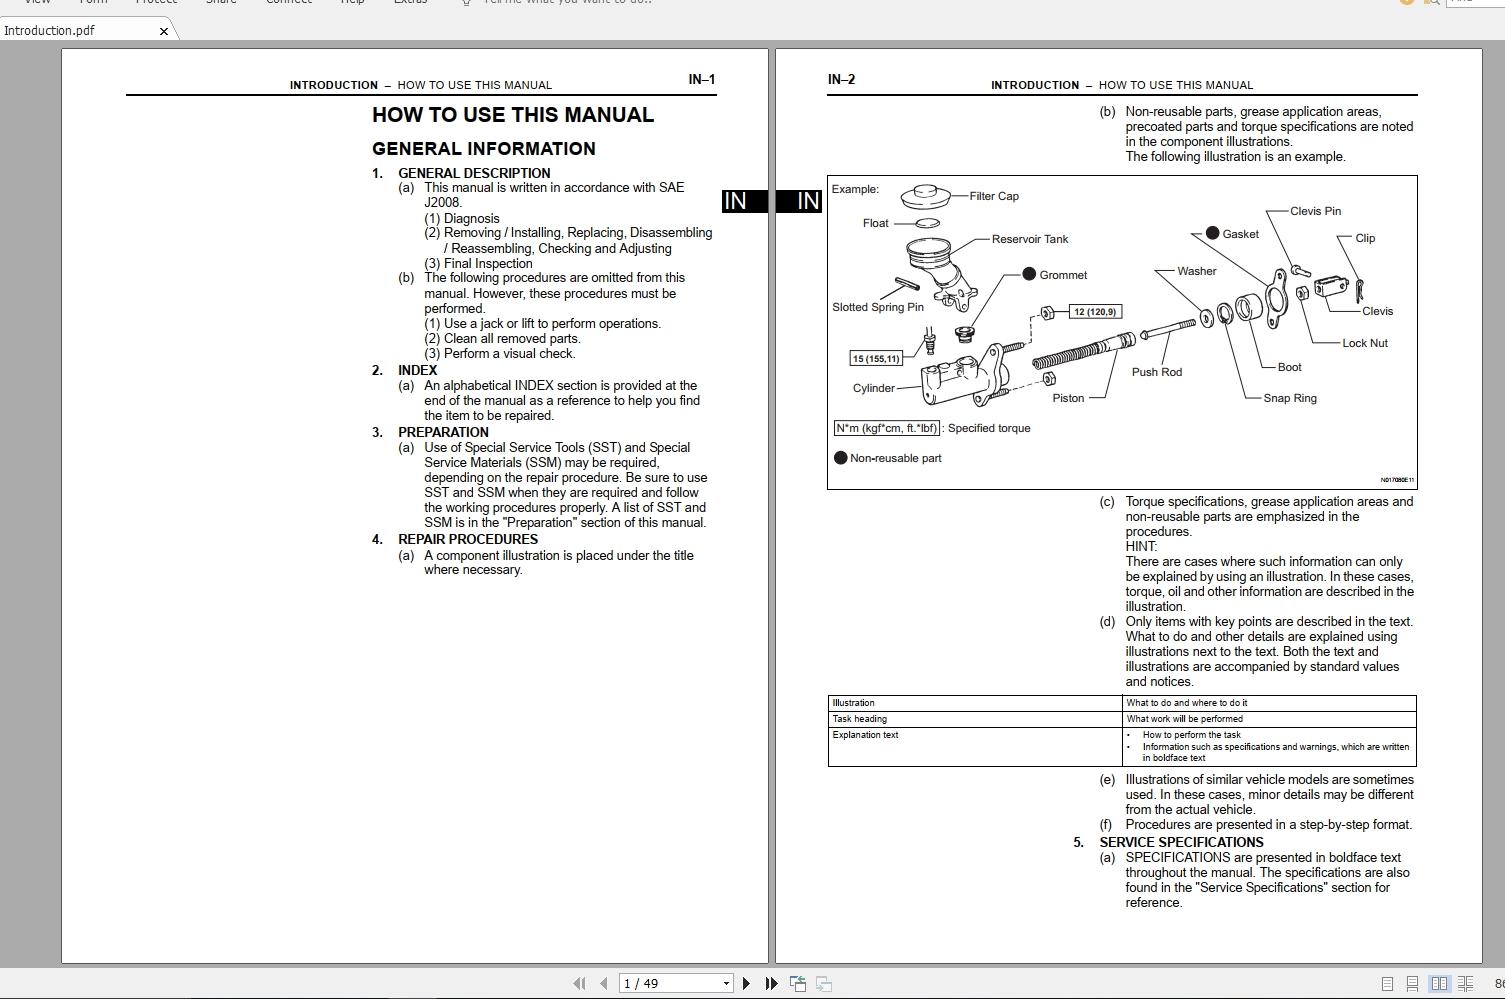 Toyota Scion tC [2007] Workshop Service Manual - Auto